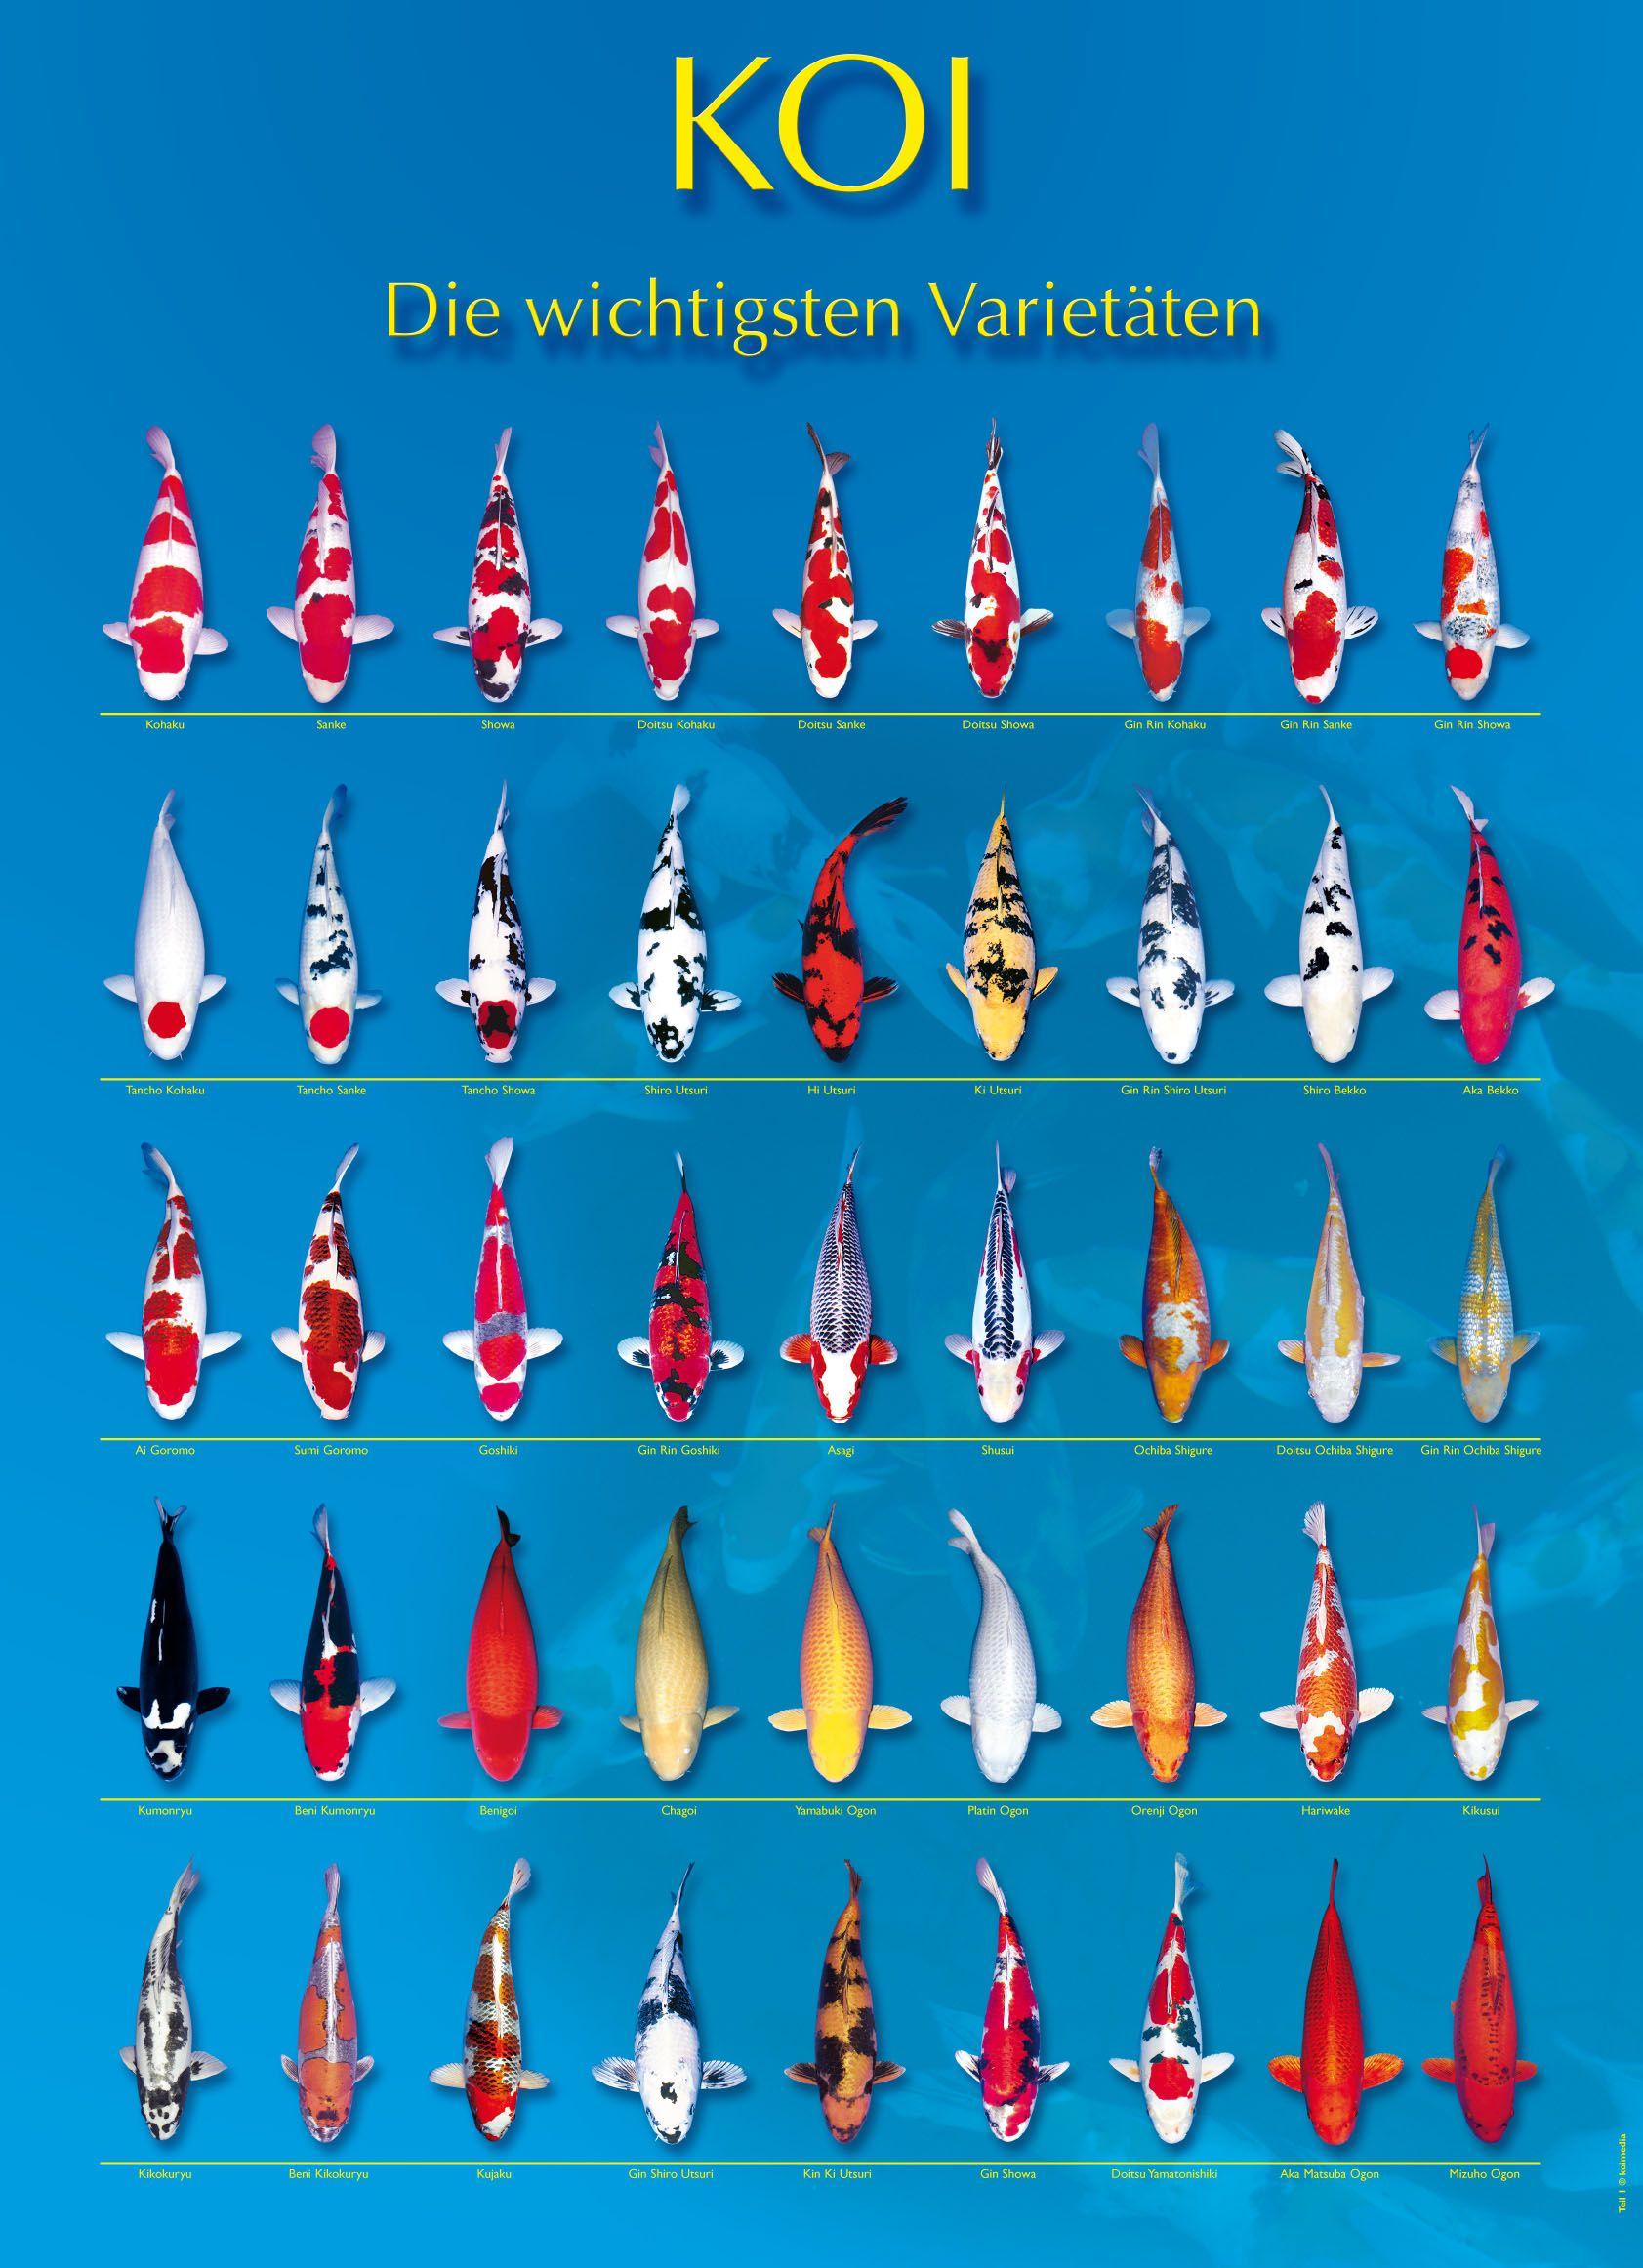 Koi fish color chart yy19830908 pinterest for Koi variety chart